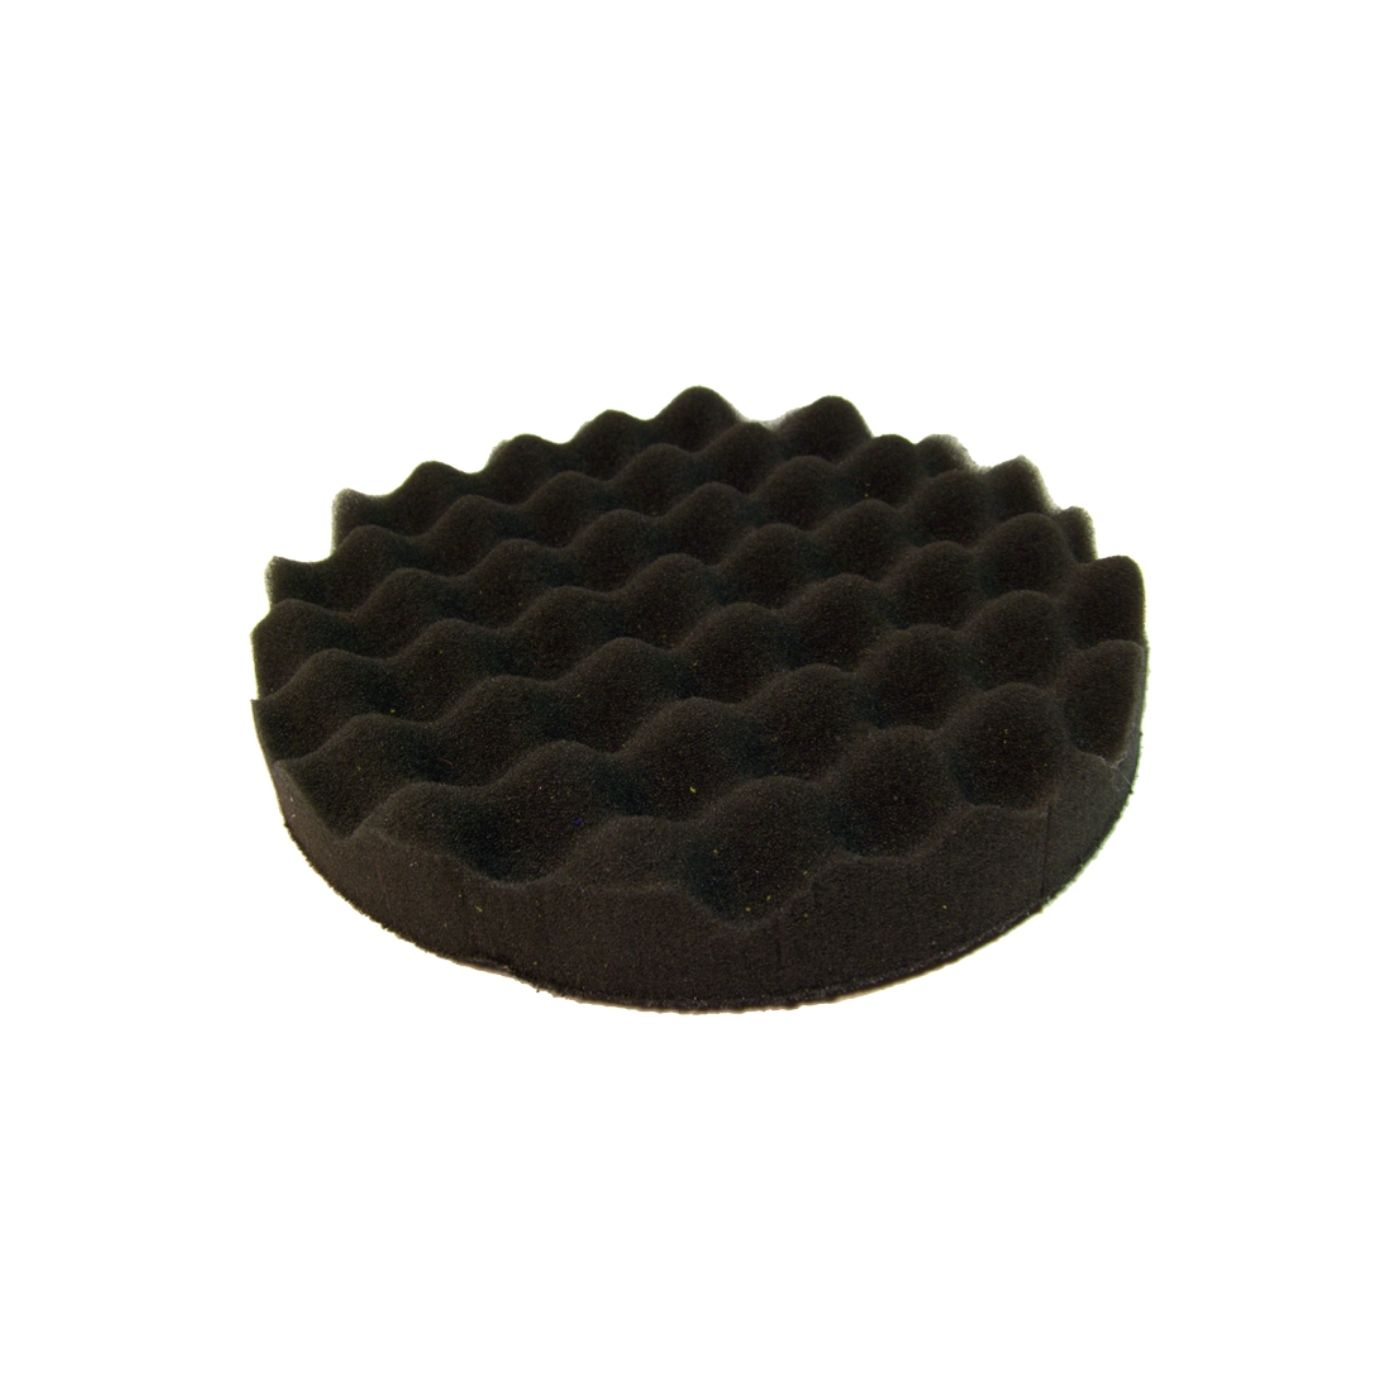 Skumrondell Turtle Wax, Våfflad Svart